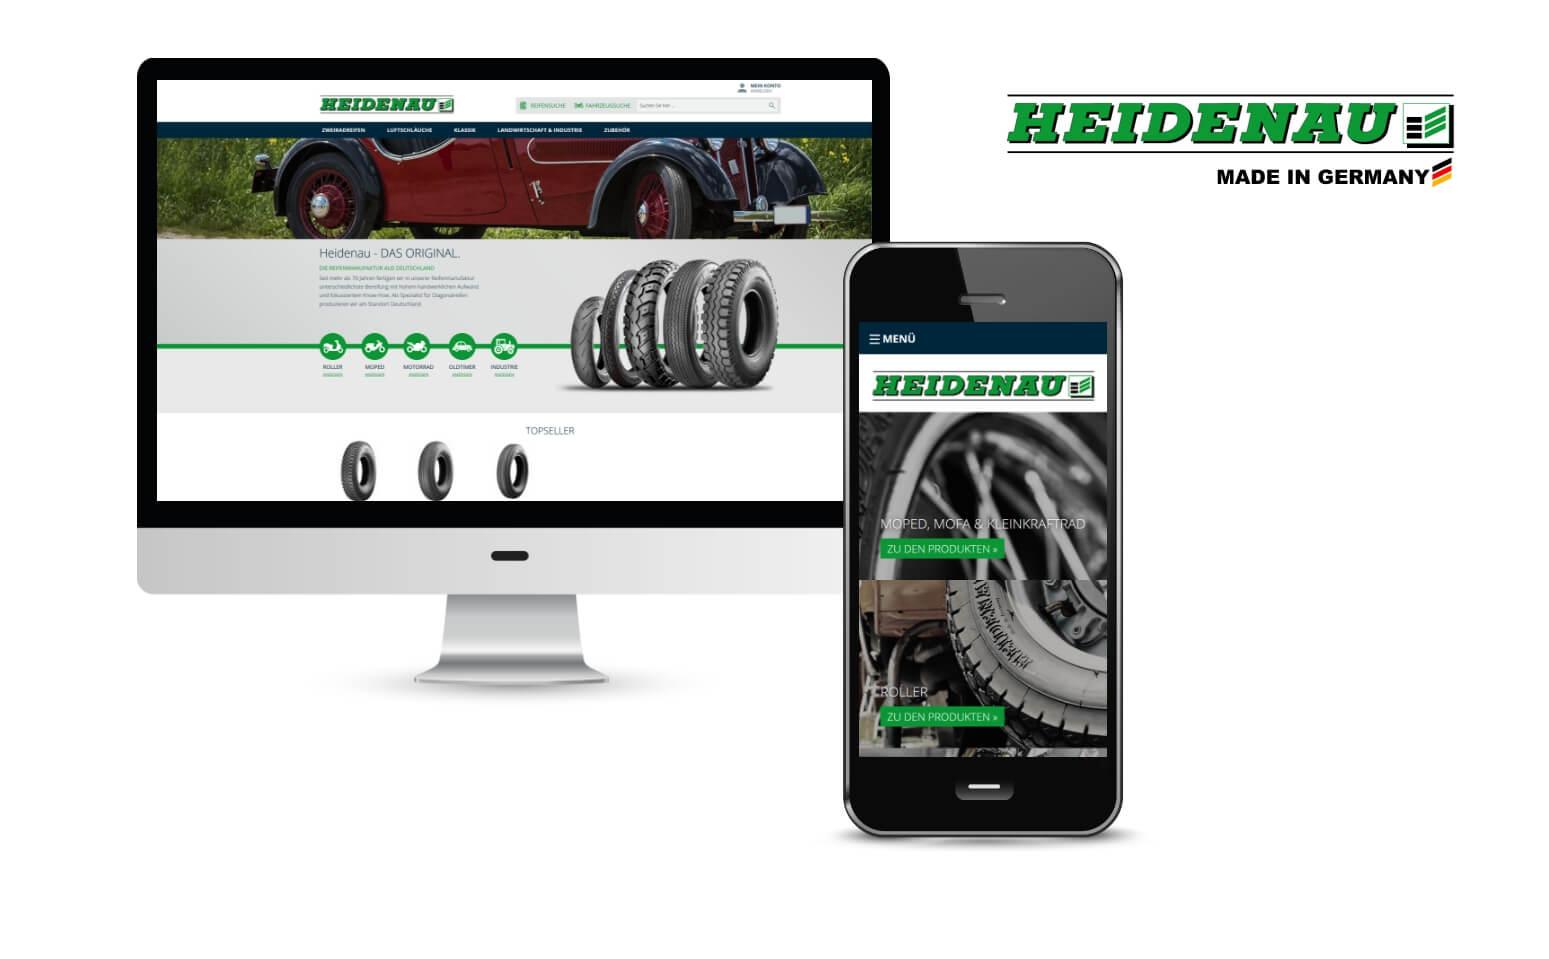 B2B Onlineshop Reifenwerk Heidenau